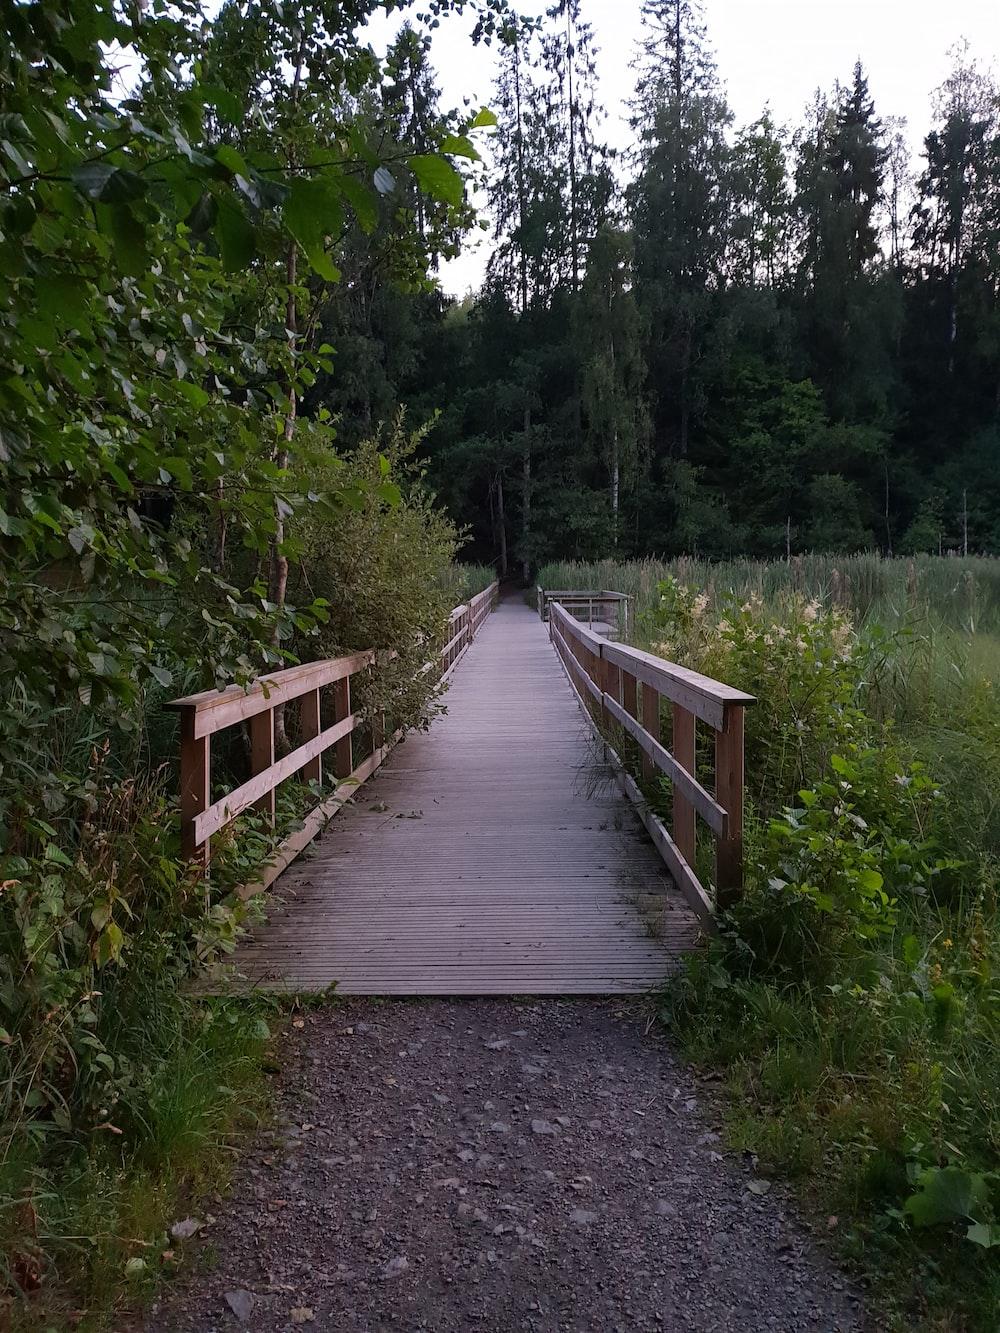 brown wooden bridge beside trees during daytime